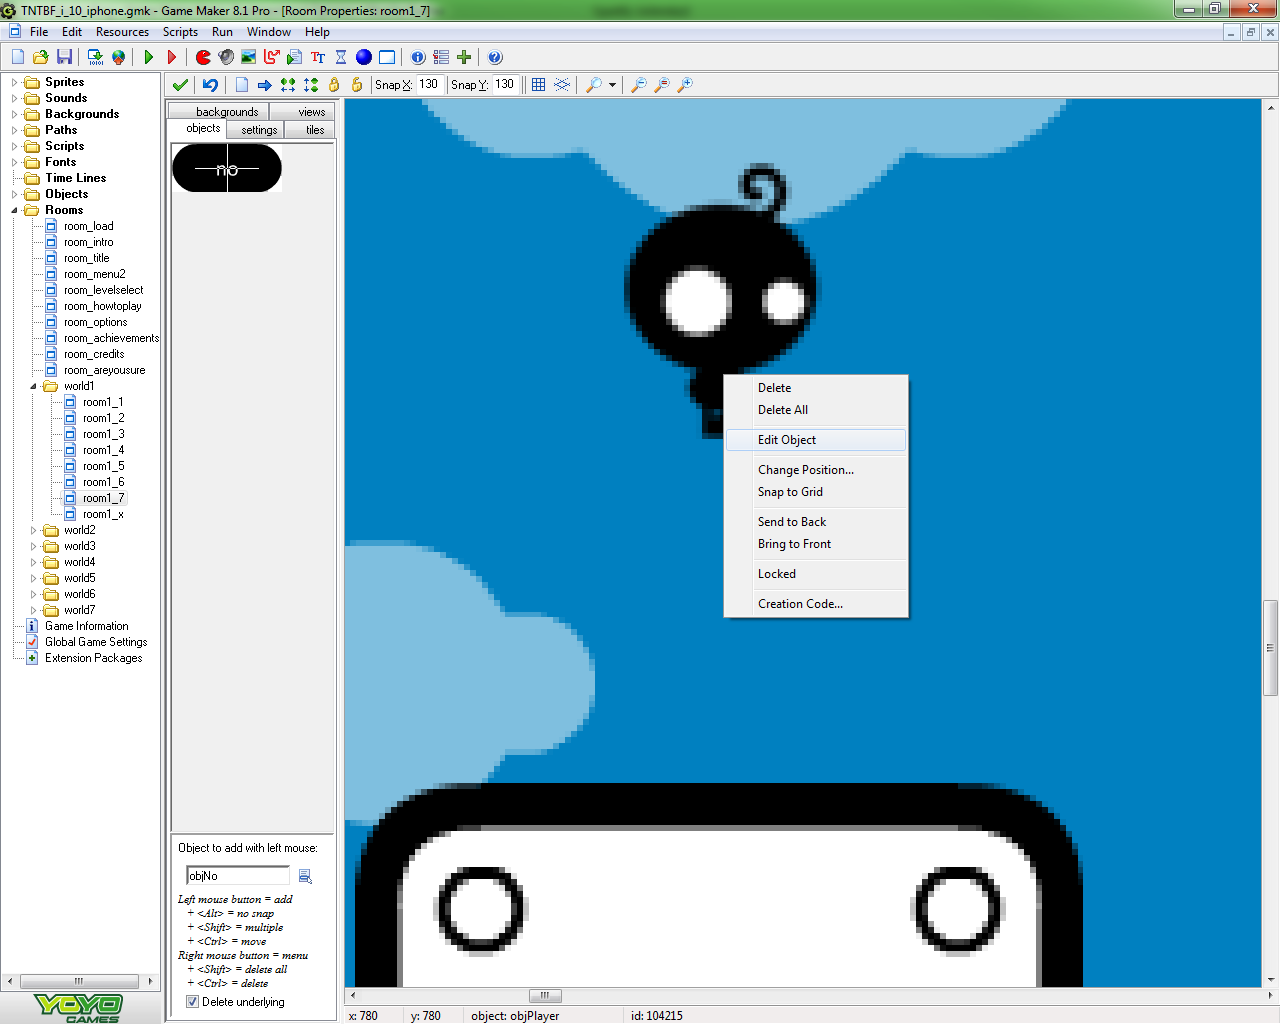 game maker 8.1 lite license key